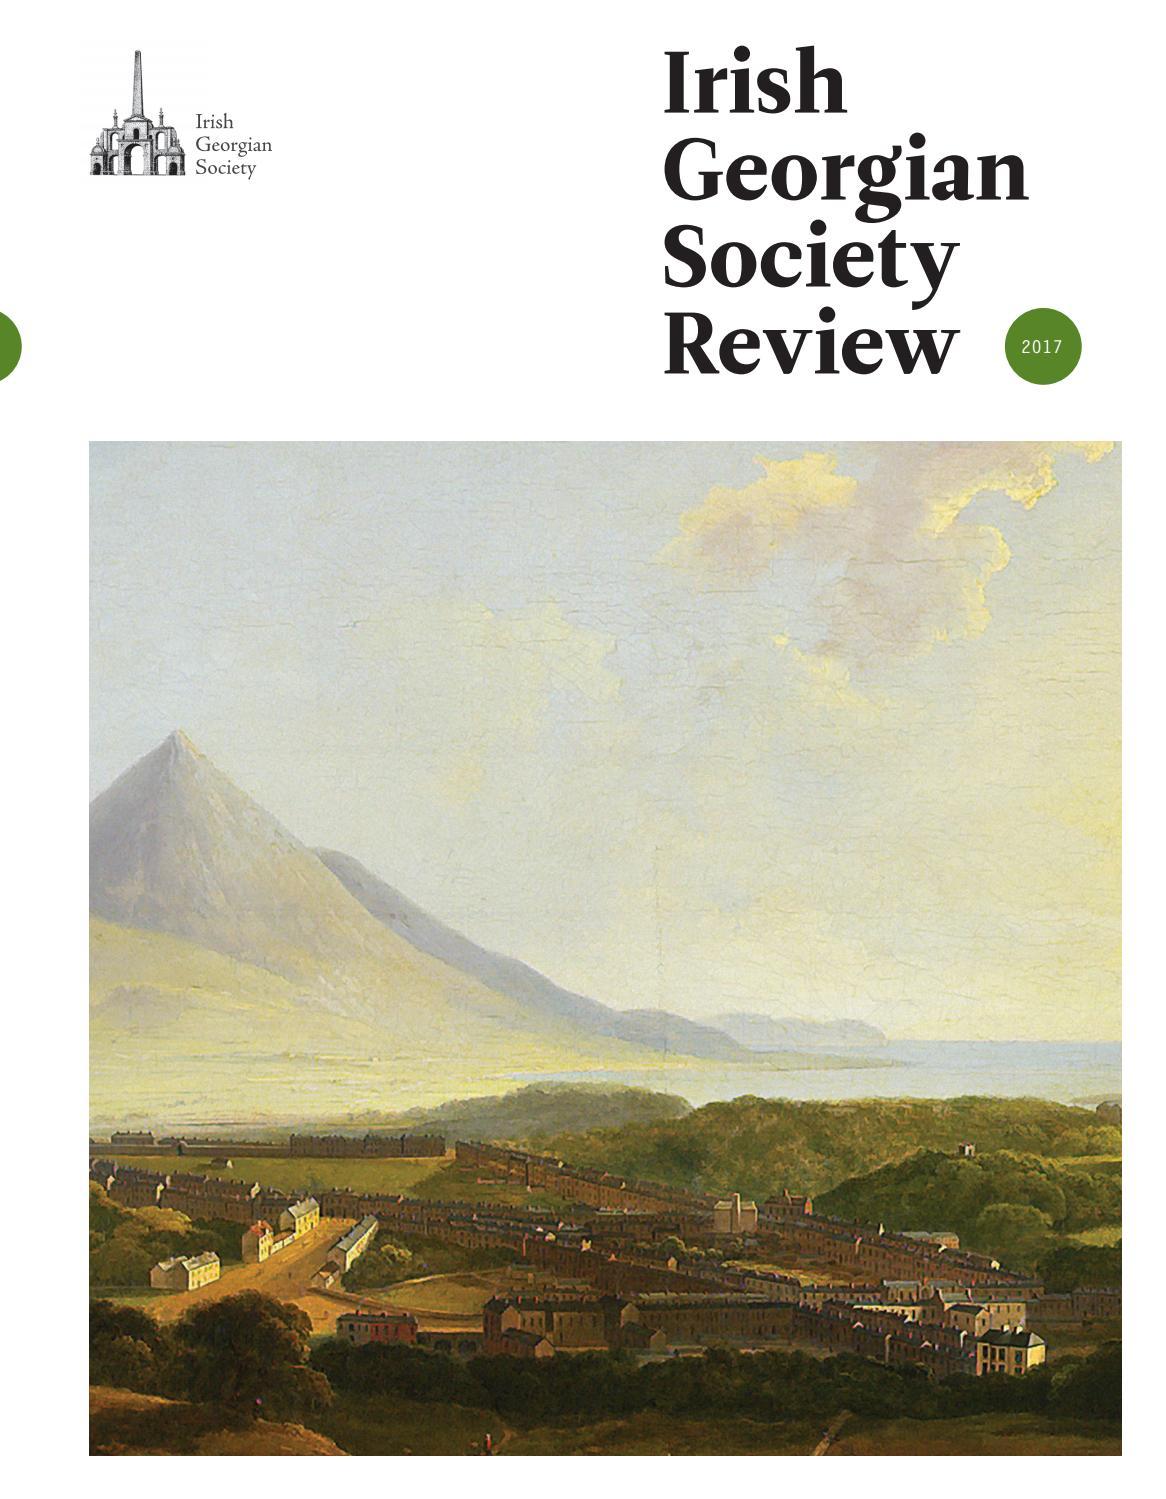 Irish Georgian Society Review - 2017